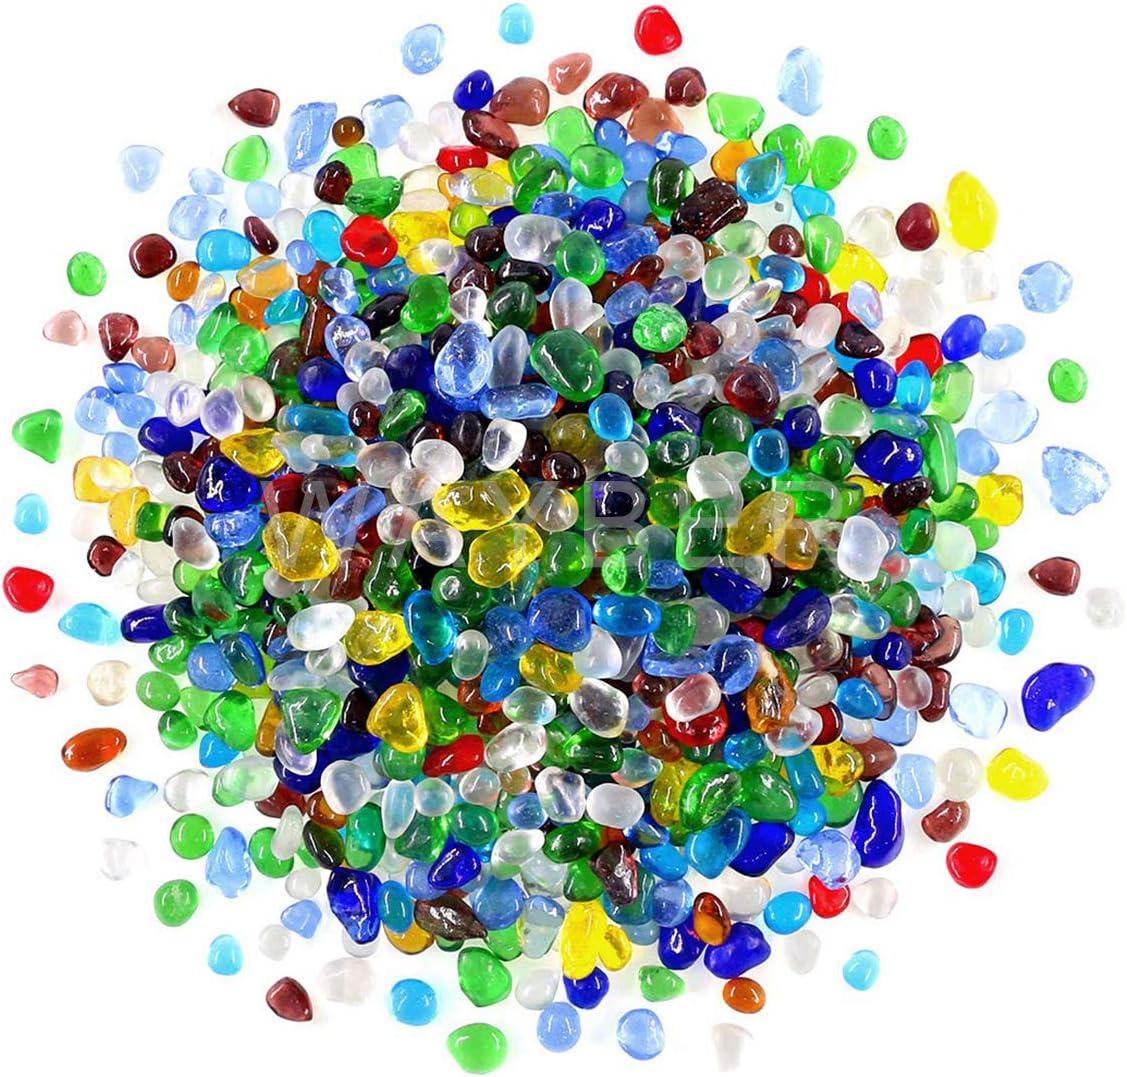 WAYBER Rainbow Glass Stones, 1Lb/460g Irregular Sea Glass Pebbles Non-Toxic Artificial Crystal Stones for Handmade Artwork/Vase Filler/Terrarium Flowerpot Aquarium Turtle Tank Decoration